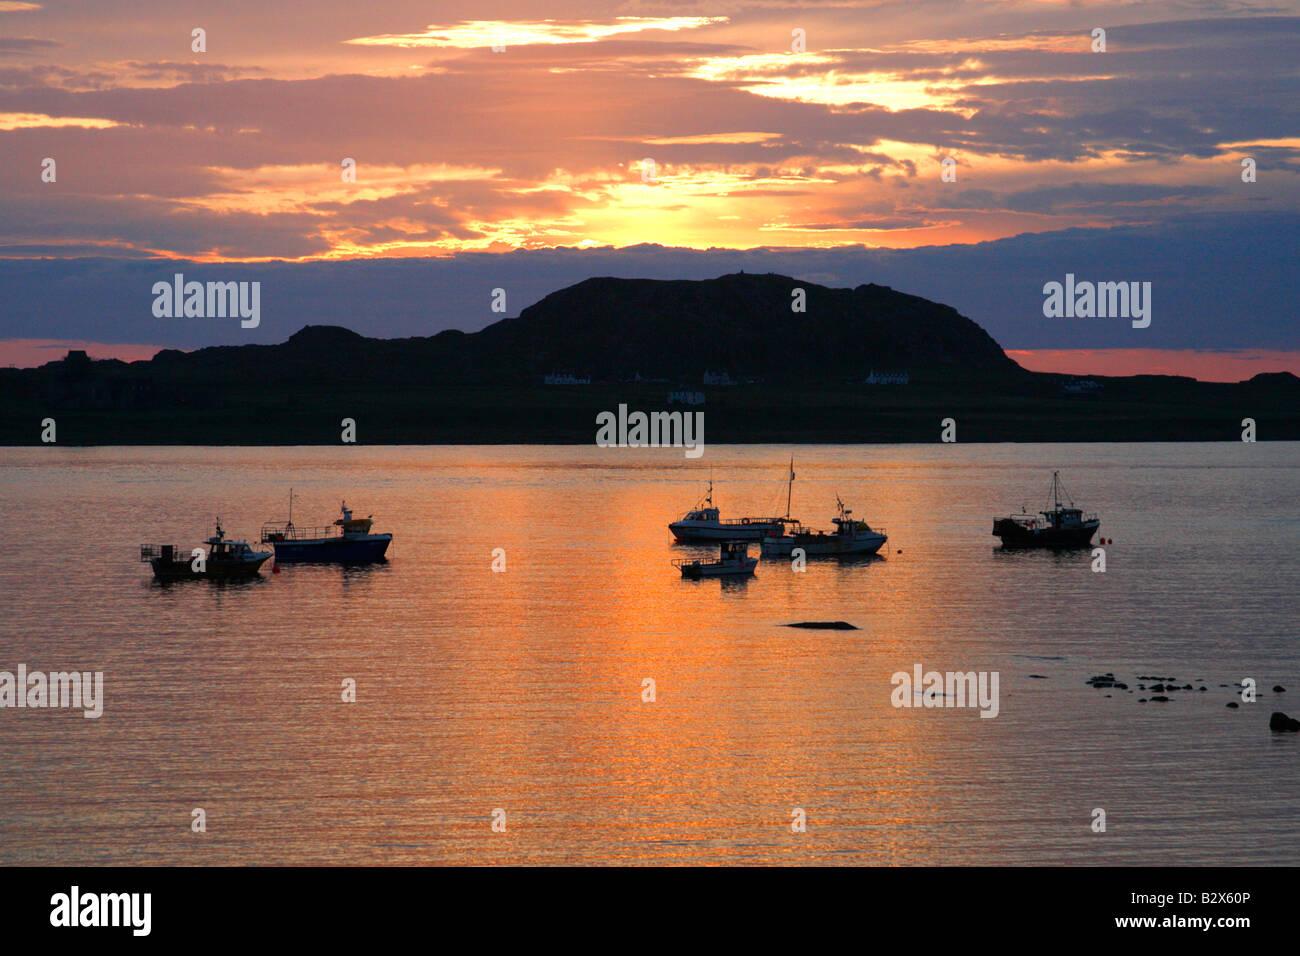 SUNSET OVER IONA TAKEN FROM ISLE OF MULL. WESTERN ISLES. SCOTLAND. UK - Stock Image